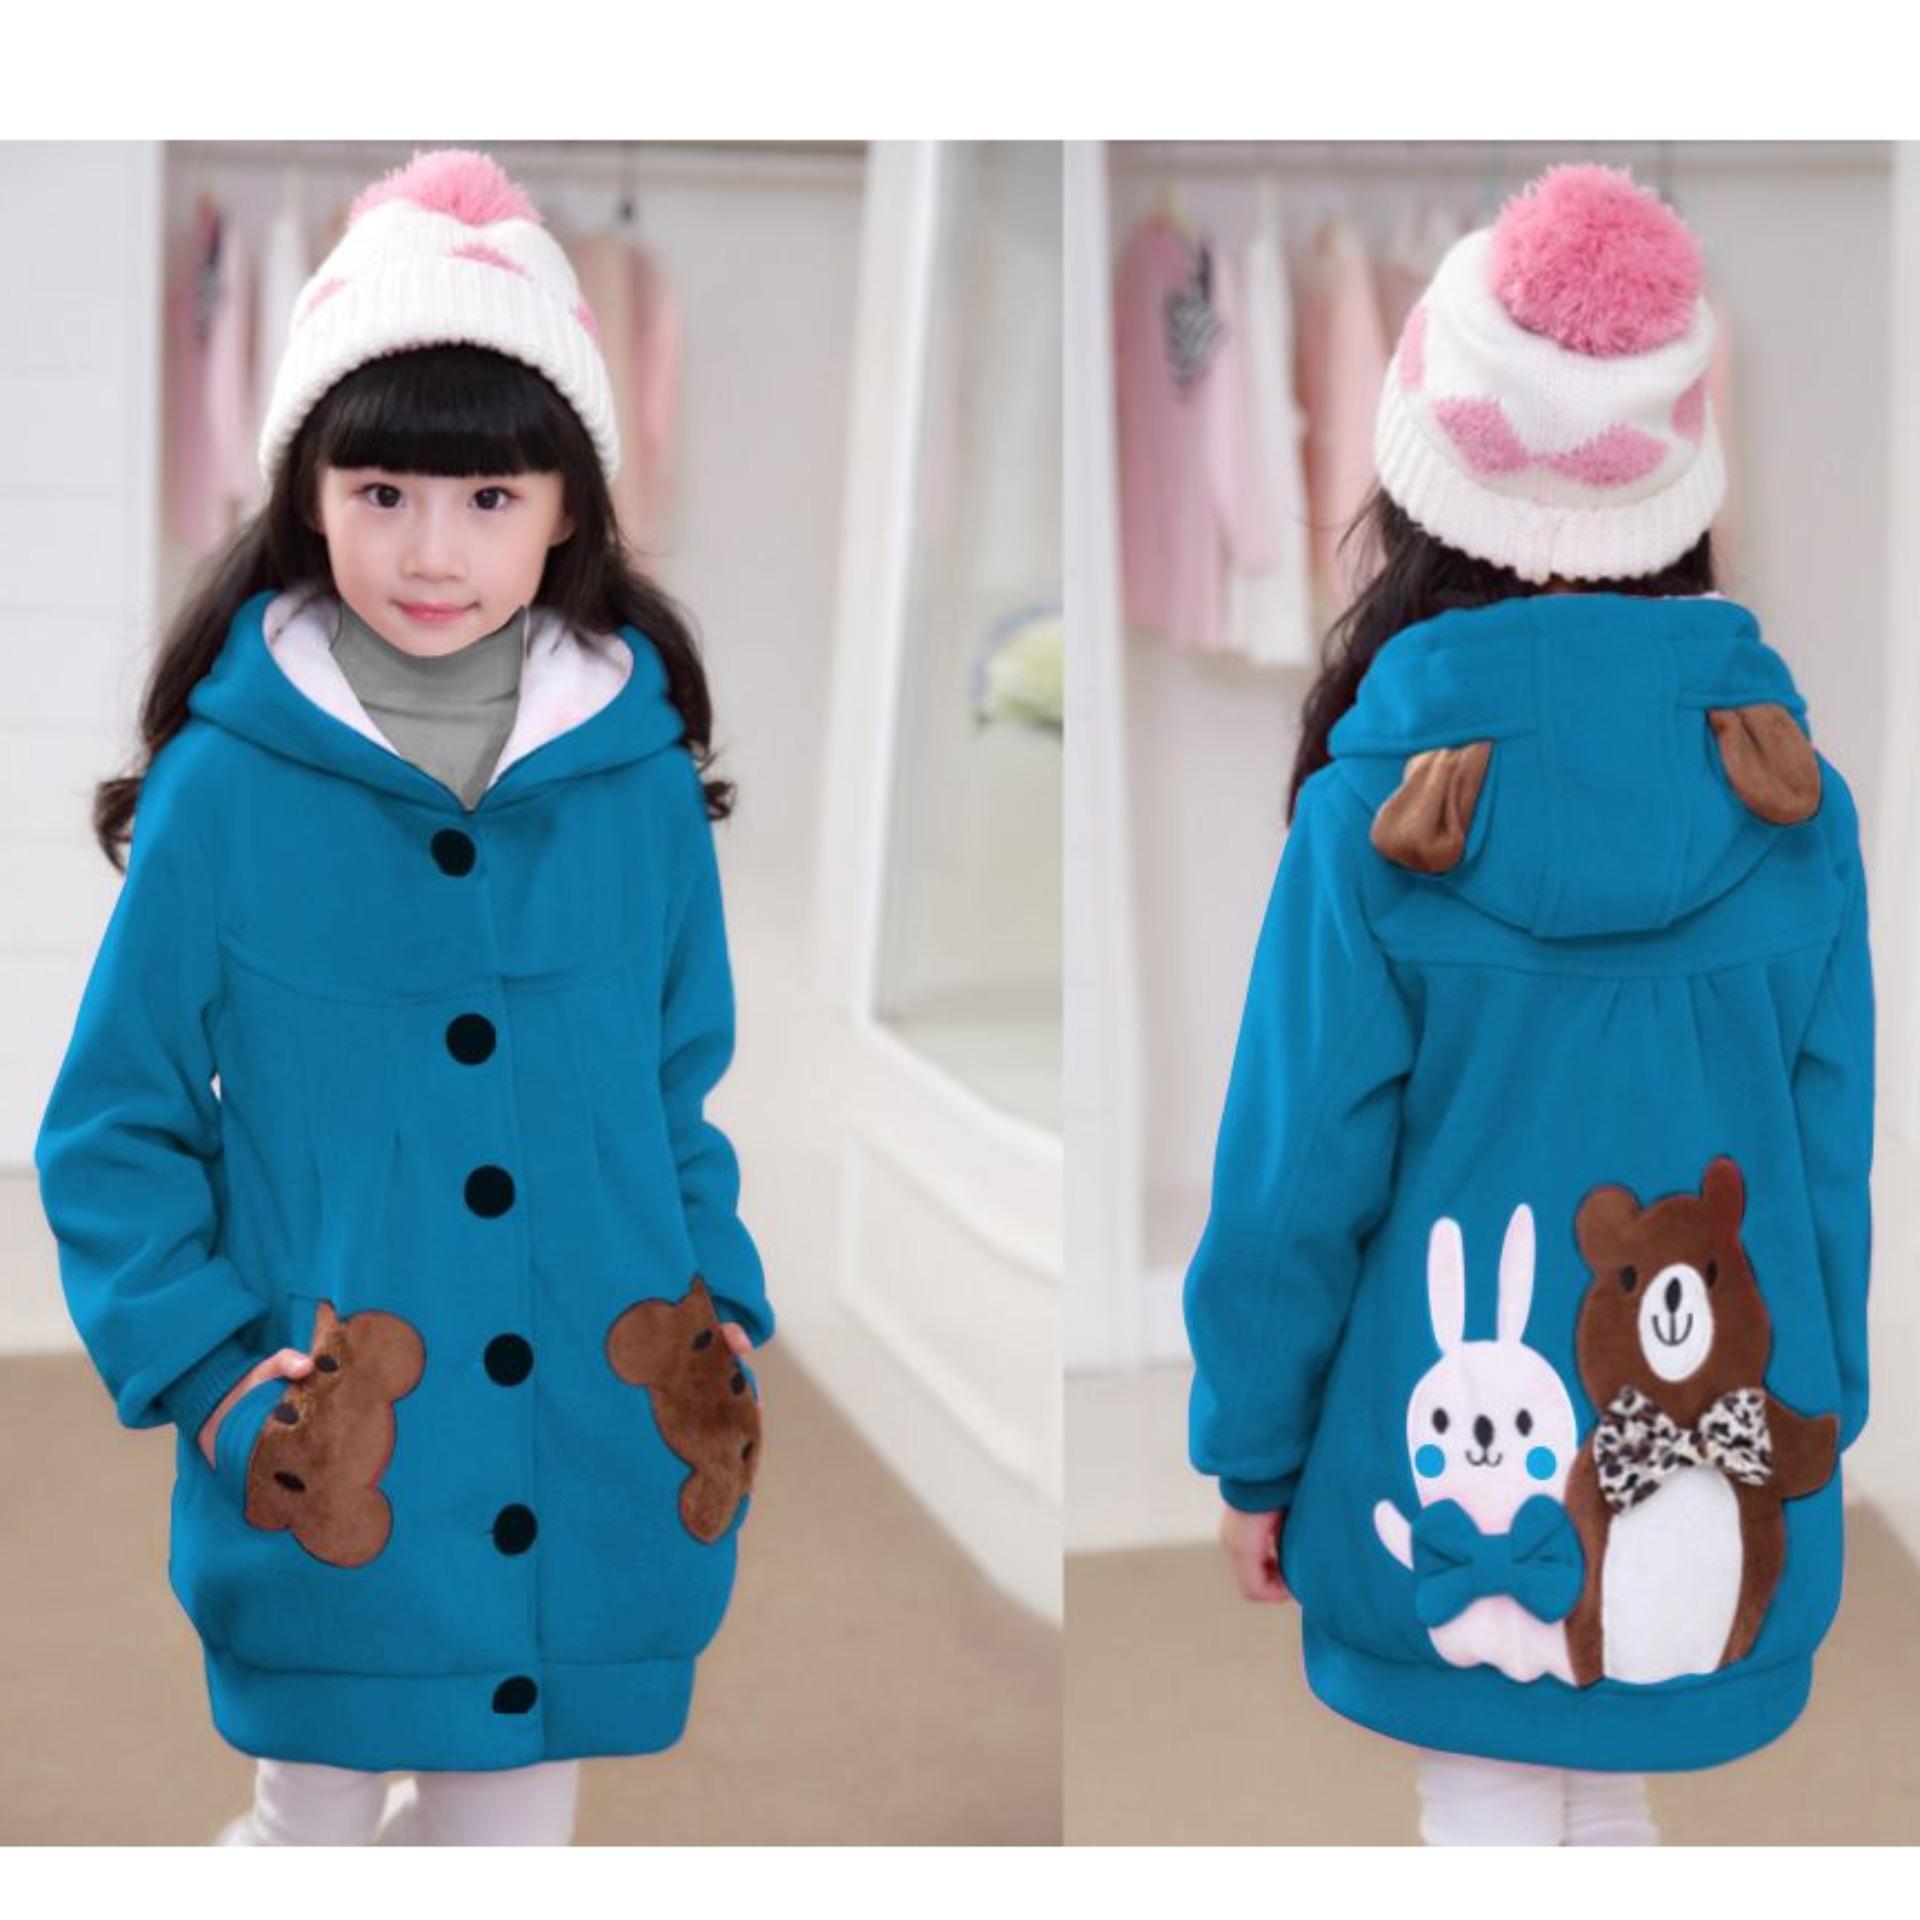 Vrichel Collection - Jaket / Hoddie Anak Perempuan Bear & Bunny